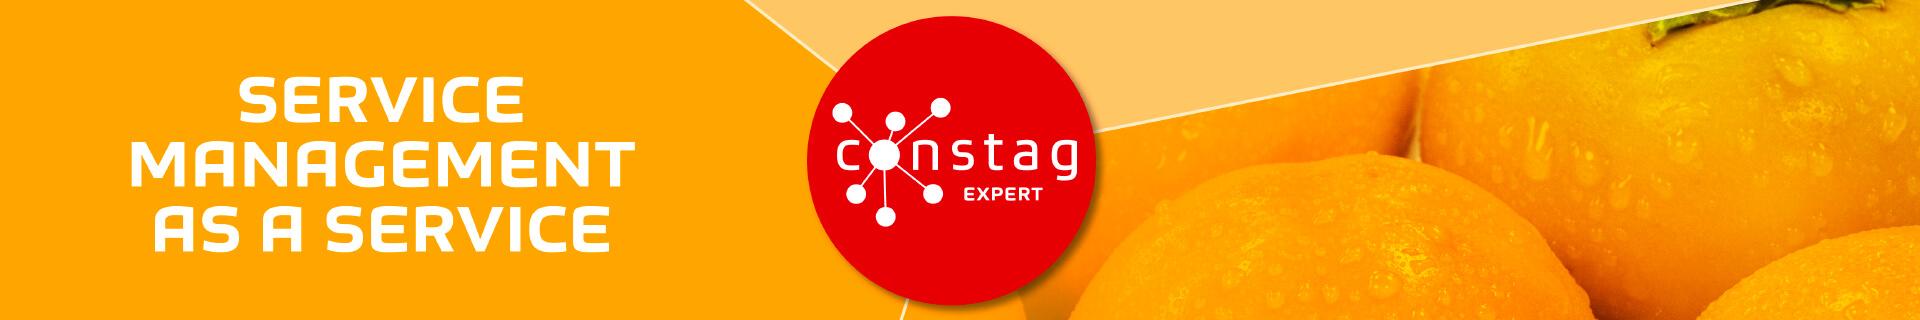 Constag Produkte Service Management EXPERT